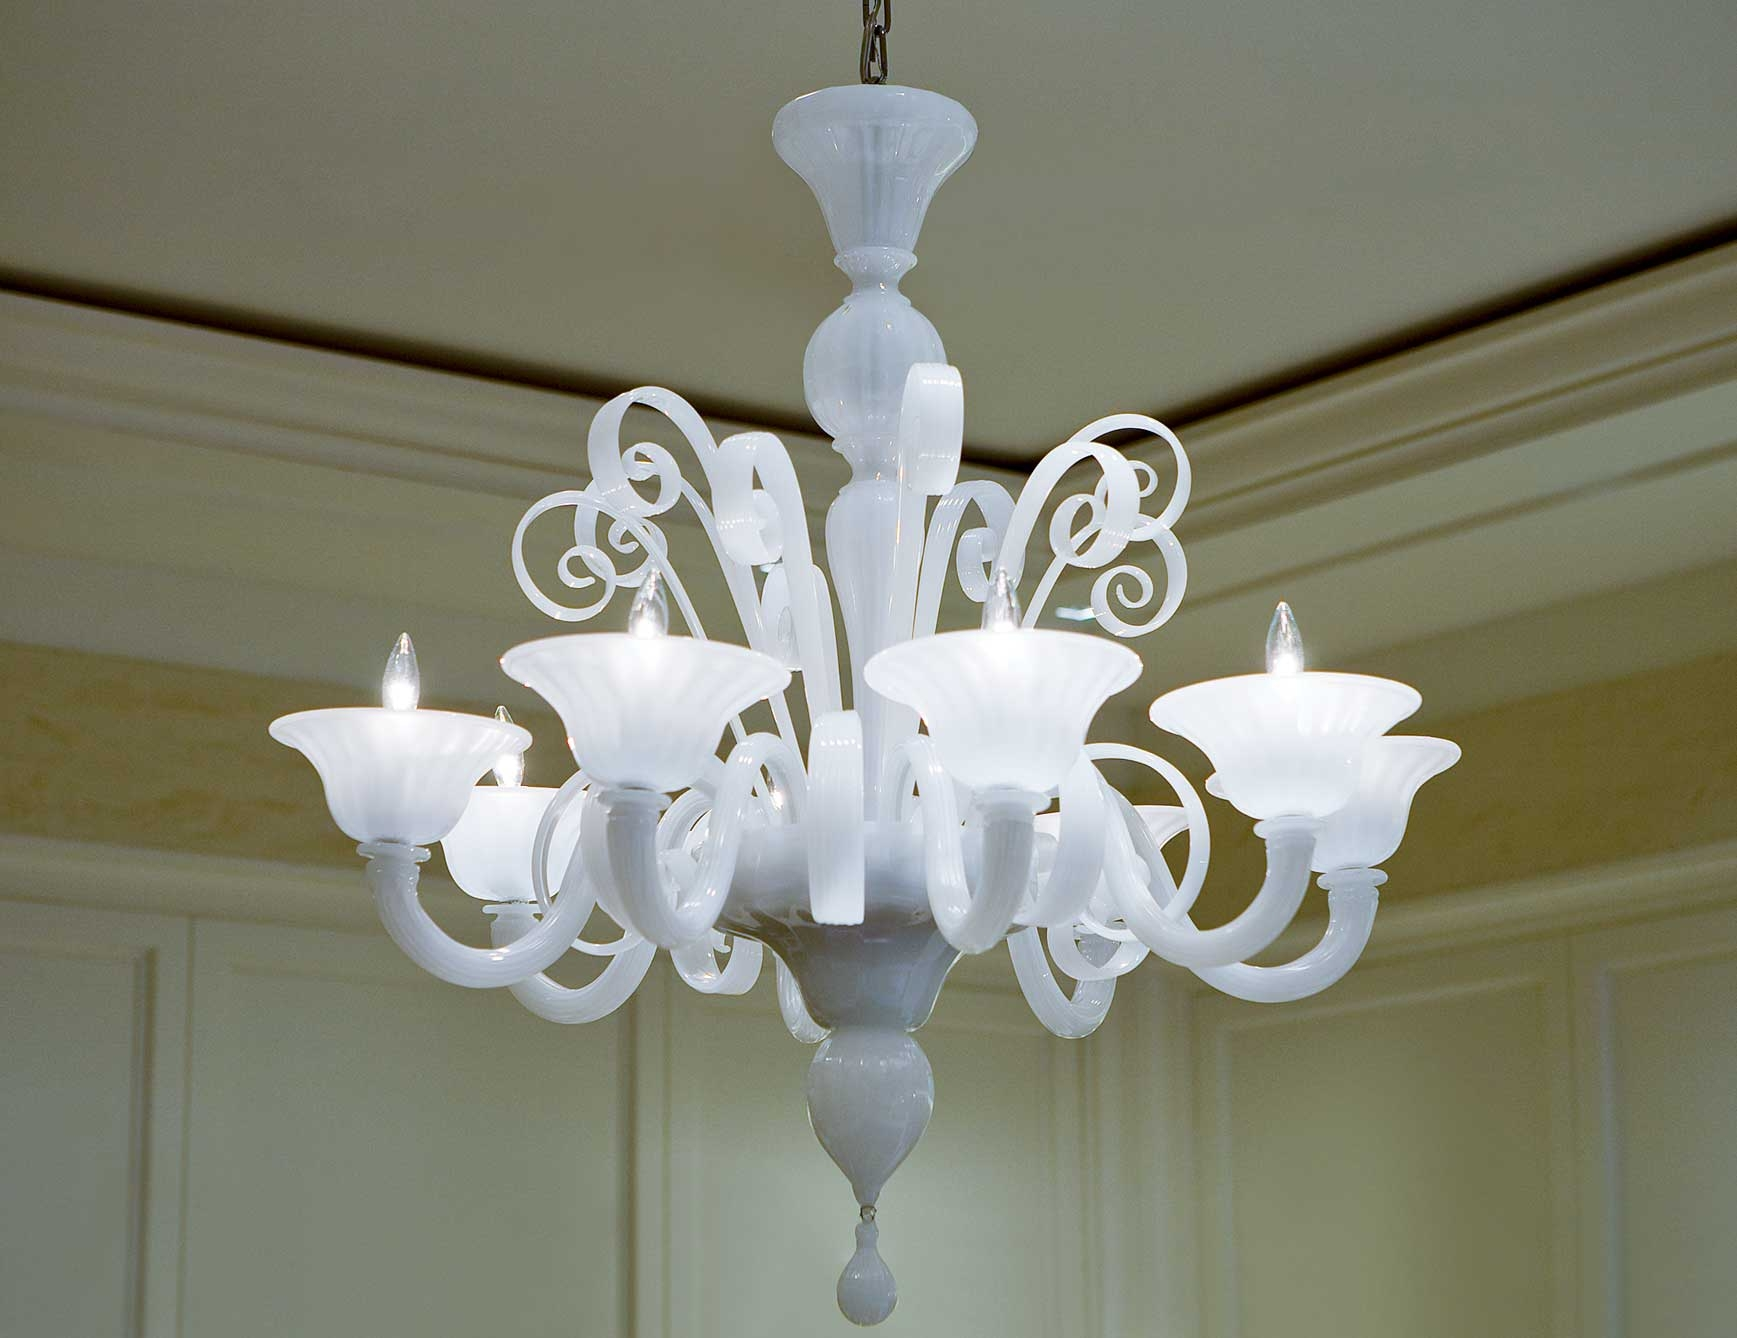 Murano Glass Chandeliers Italian Designer Luxury Chandeliers Regarding White Chandeliers (Image 12 of 15)